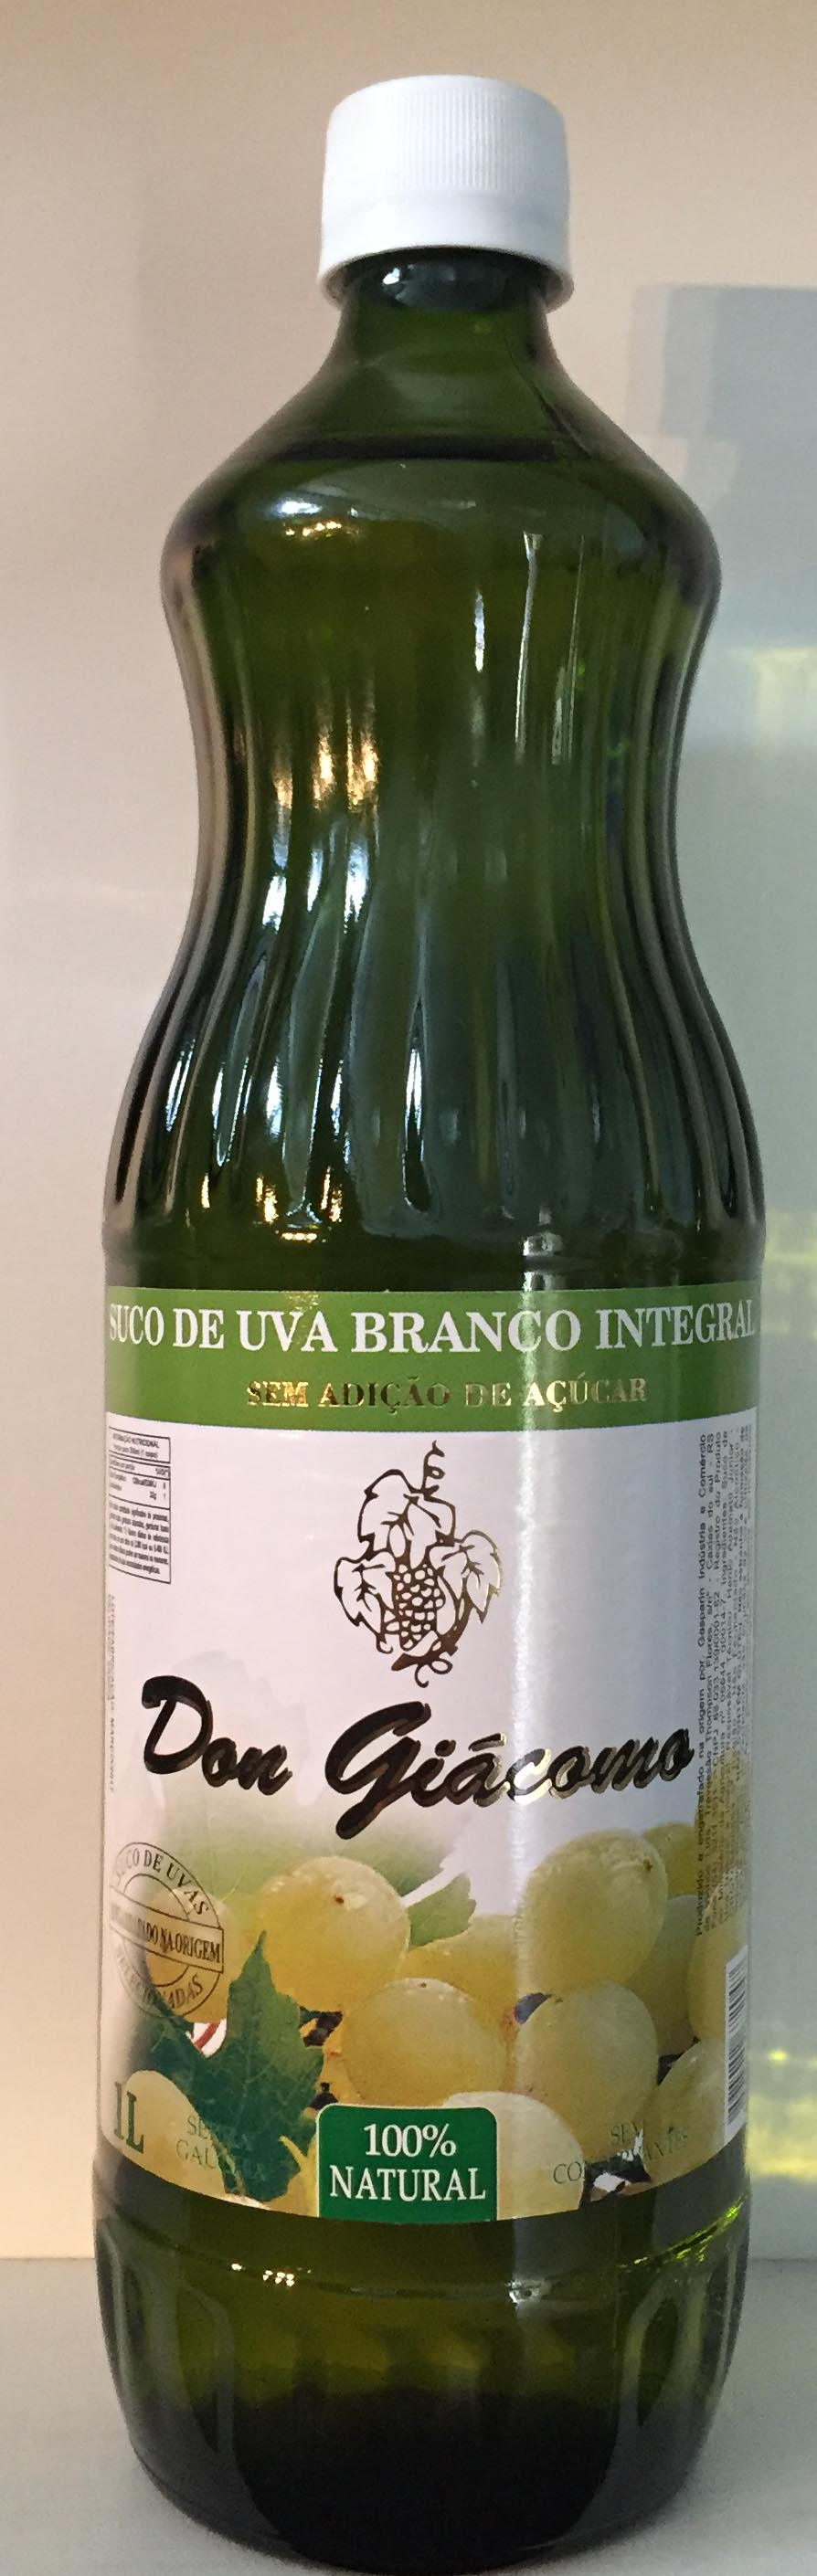 SUCO DE UVA BRANCO INTEGRAL 1 LT